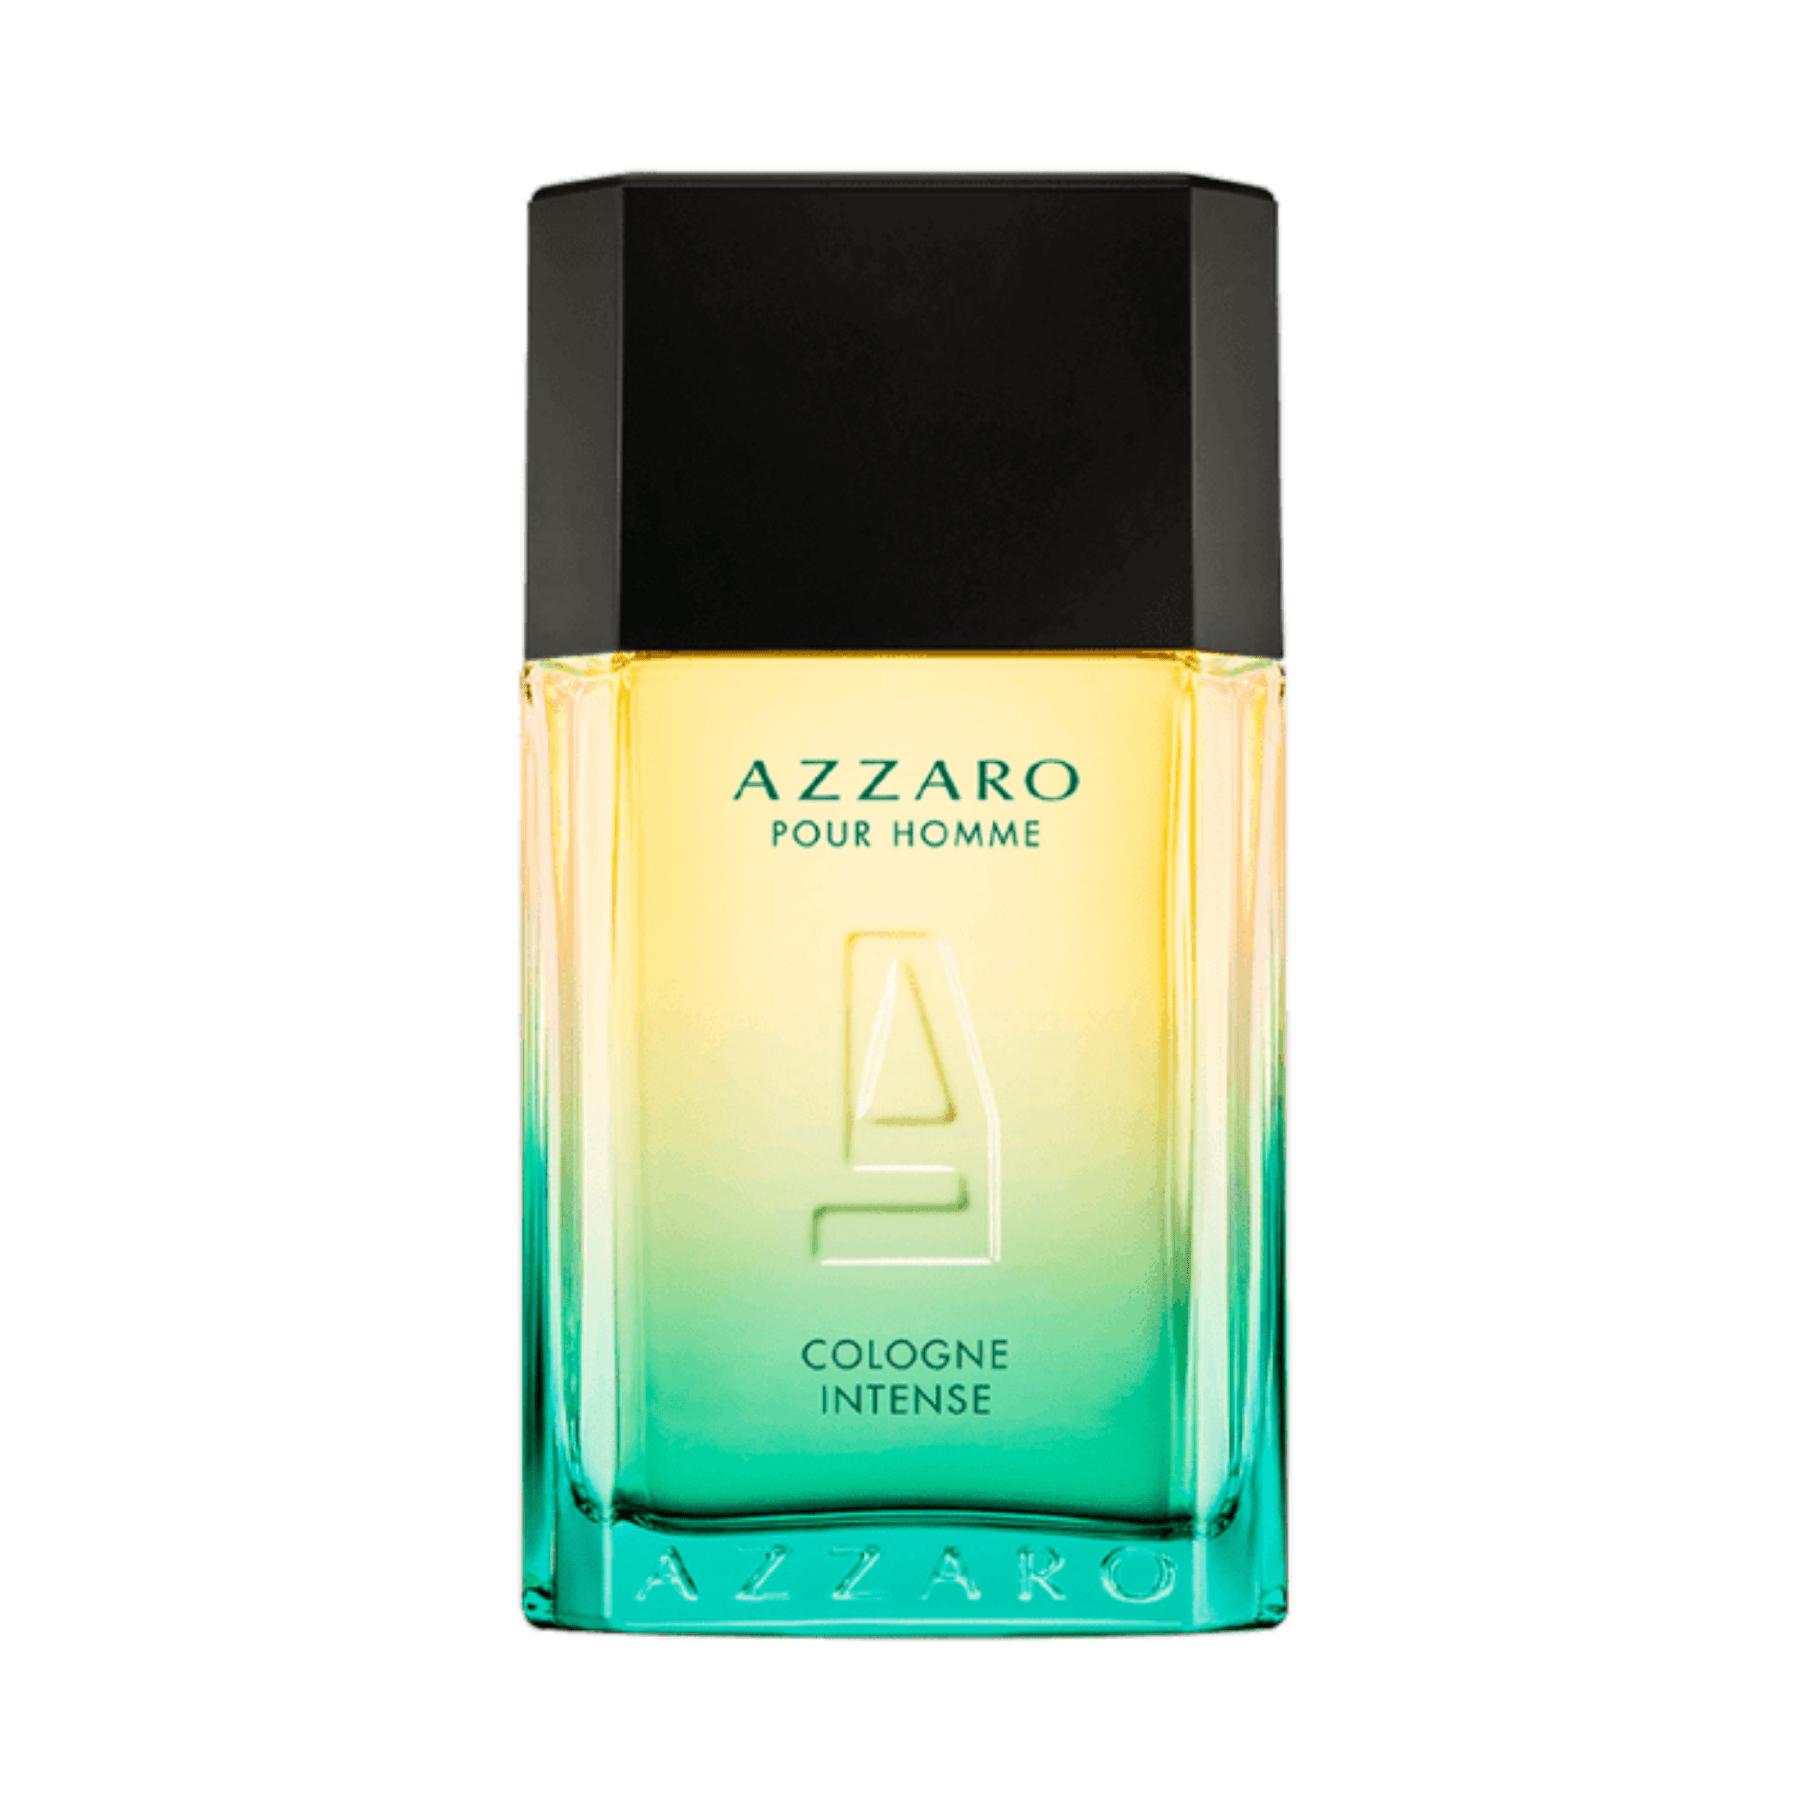 Azzaro Pour Homme Cologne Intense Eau de Toilette - Perfume Masculino 100ml